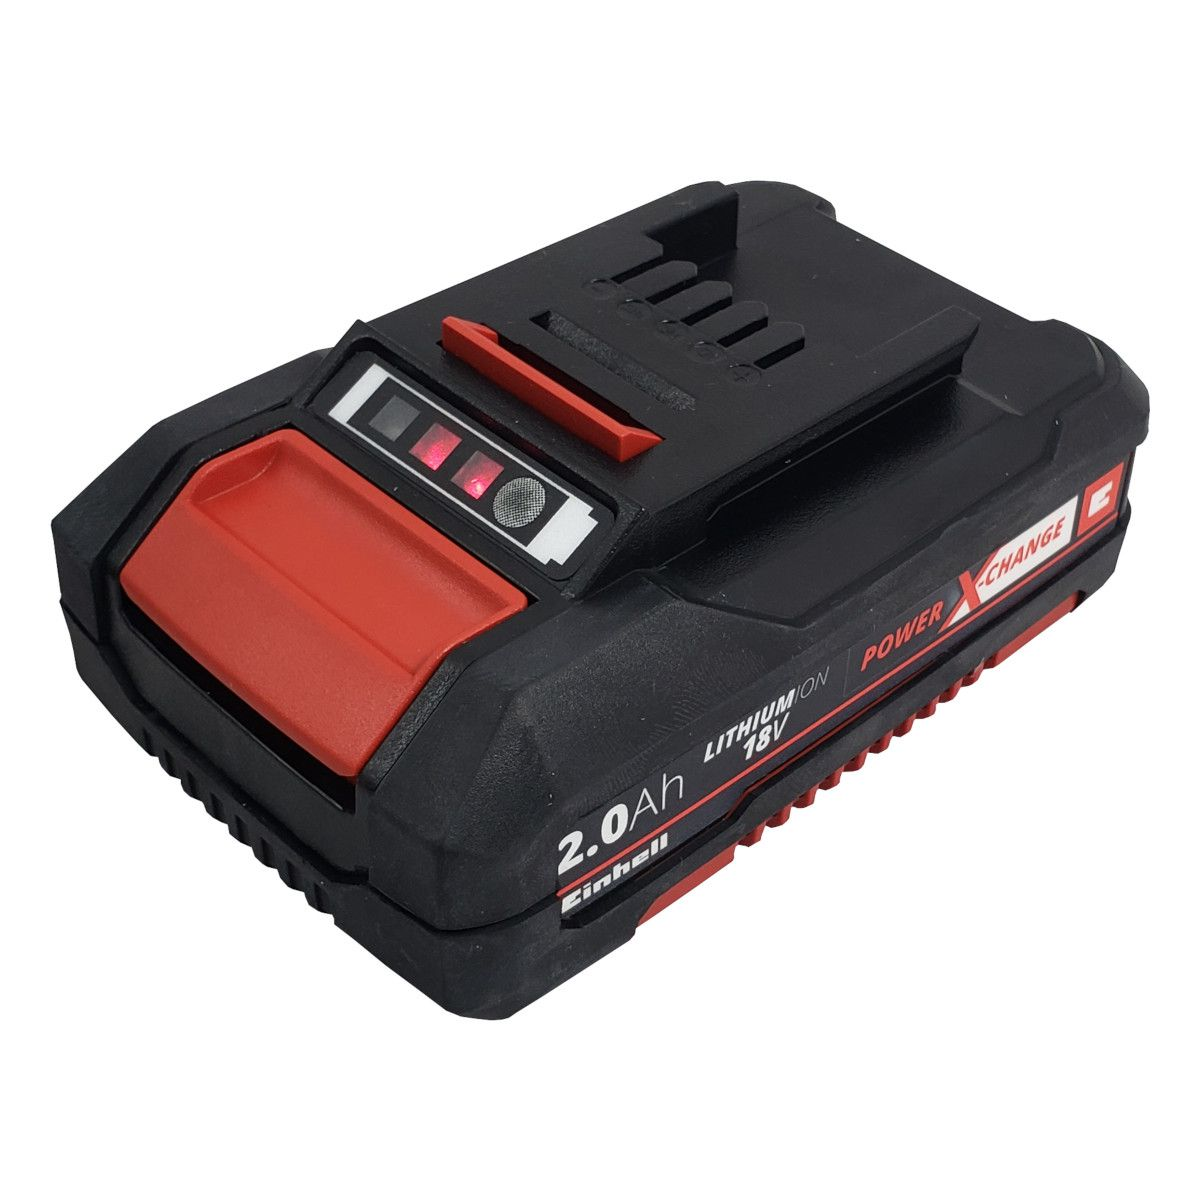 Kit Bateria e Carregador Bivolt, 18v, 2ah Einhell 4512046